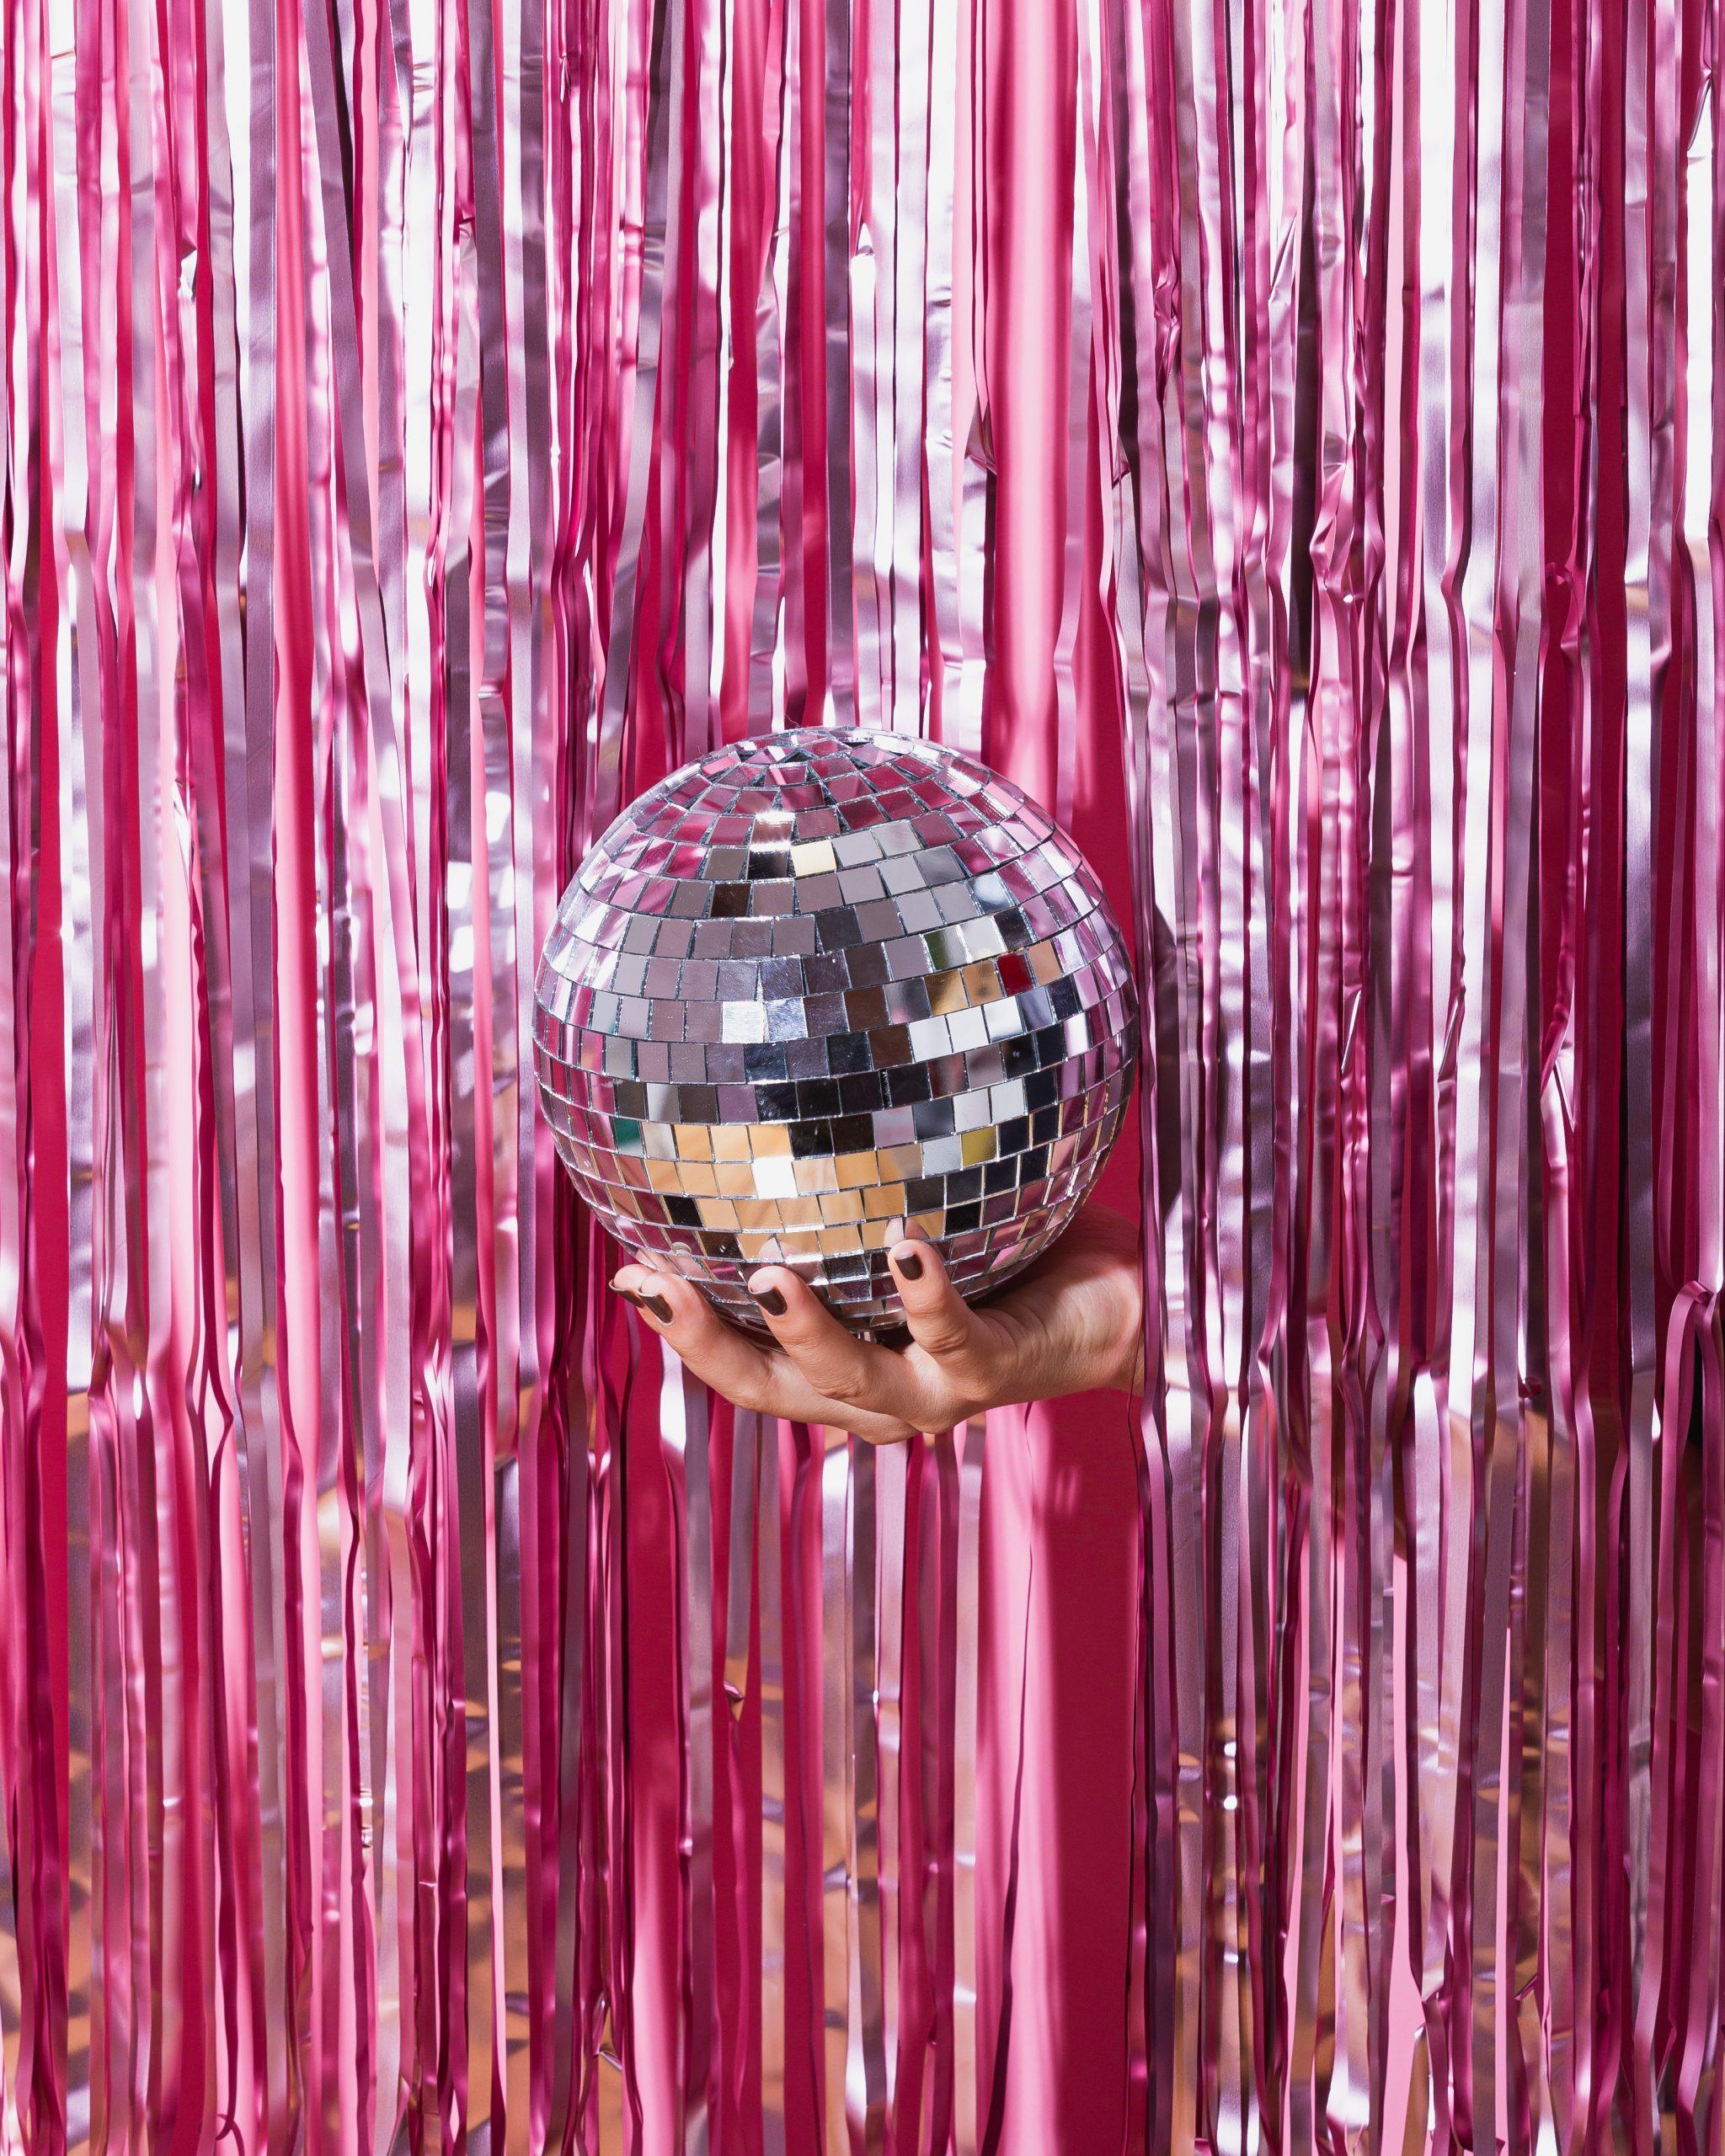 disco ball on a shiny background